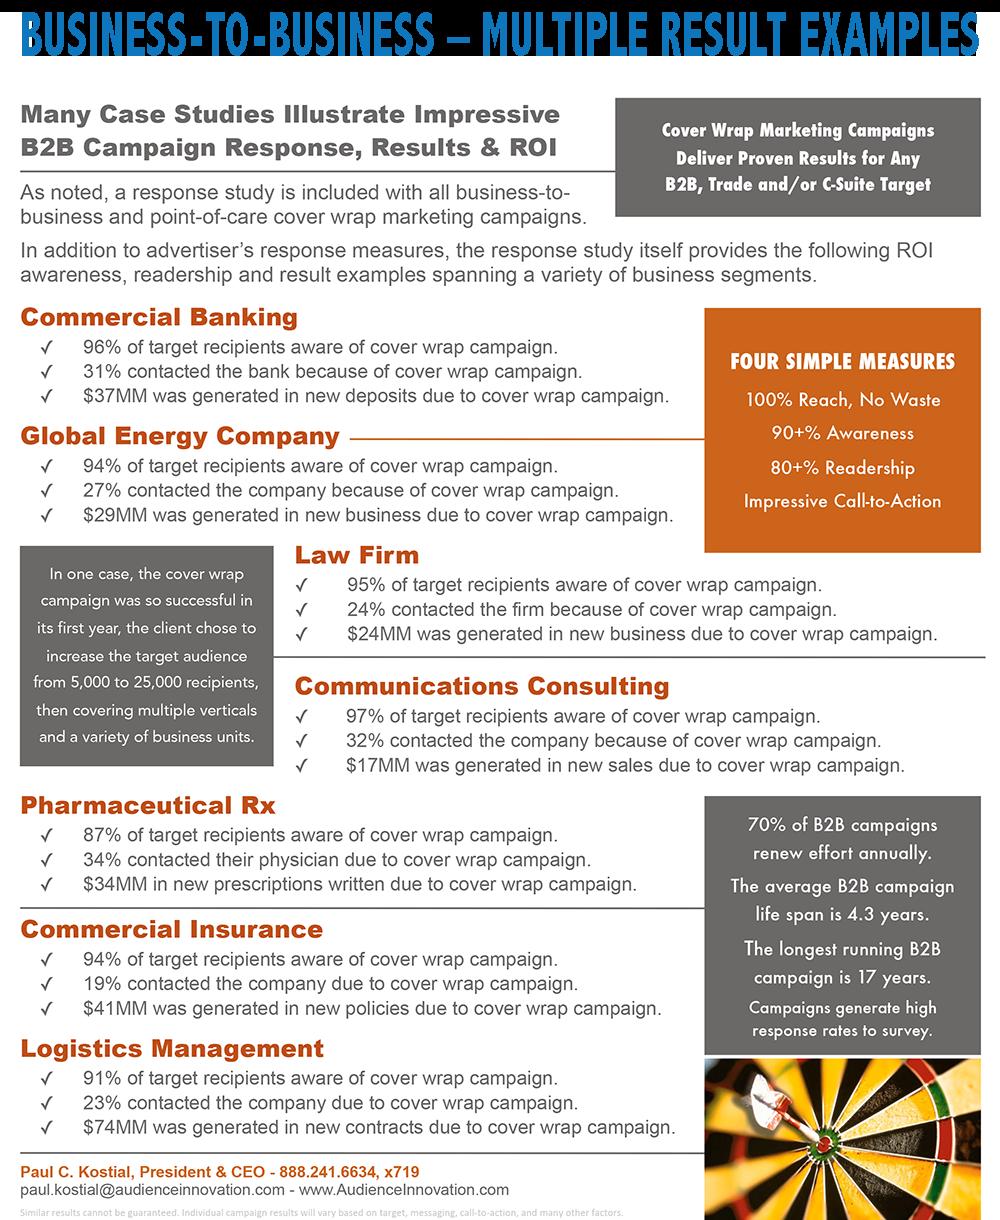 Audience Innovation Magazine Cover Wrap Marketing Partners